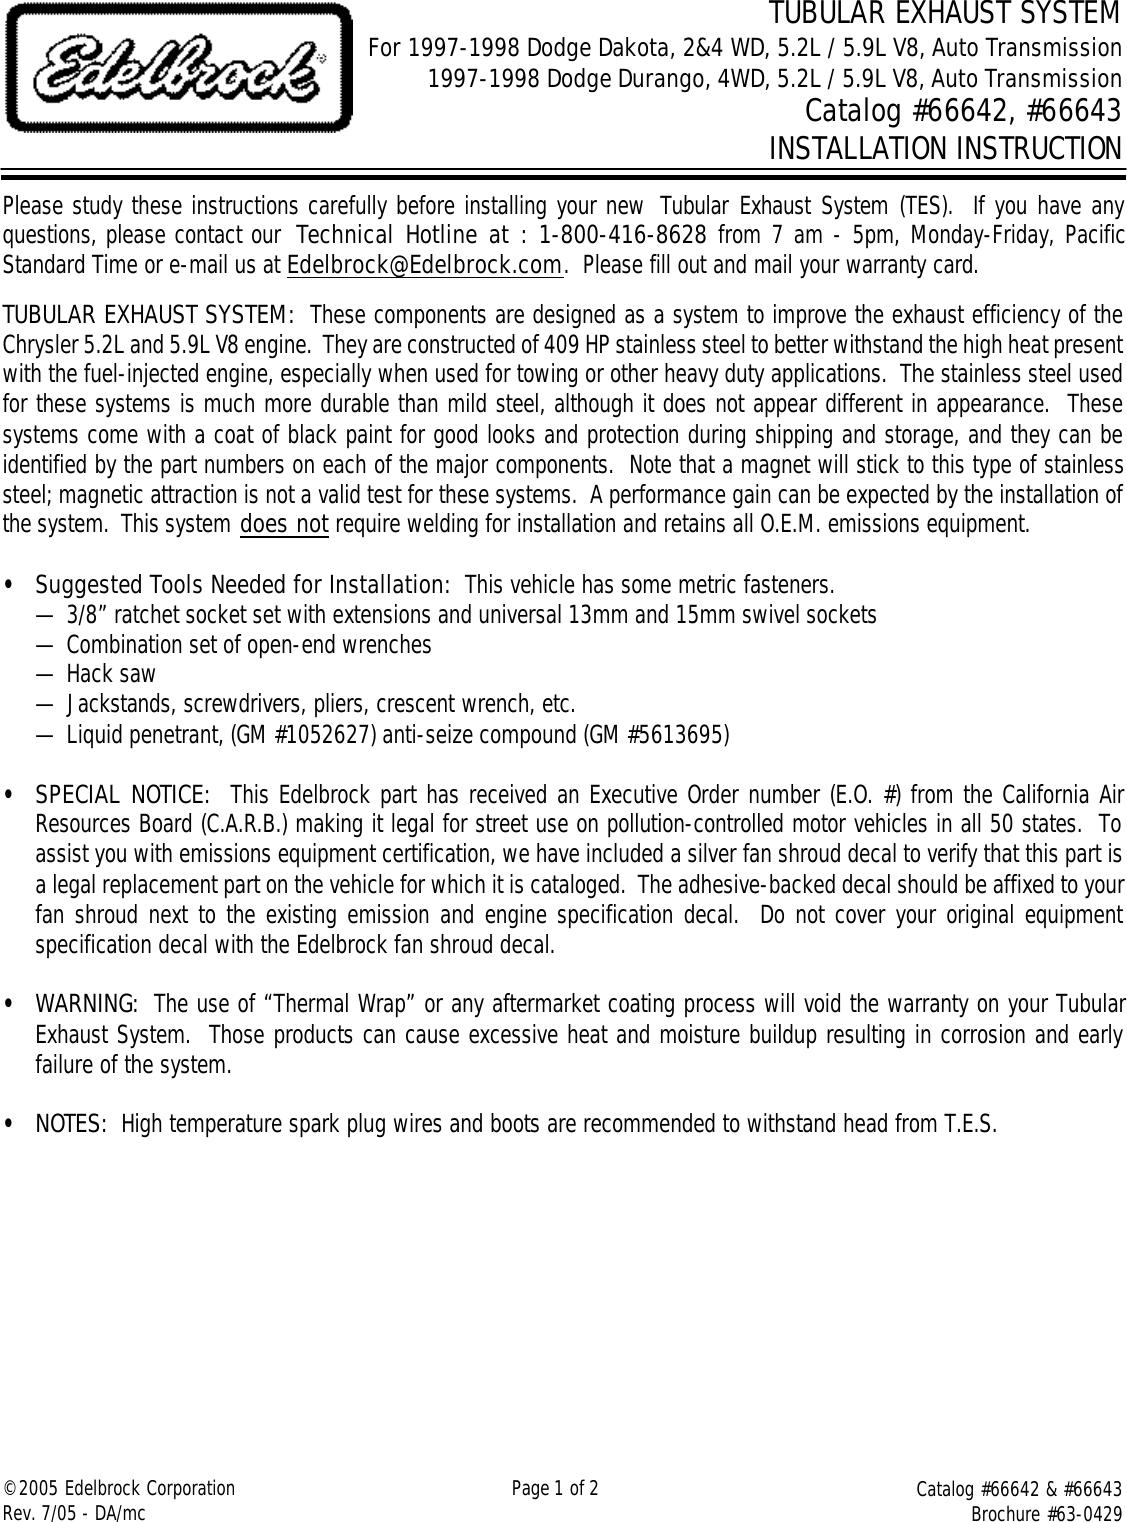 hight resolution of edelbrock 66642 users manual 66642 66643 tes for 97 98 dodge dakota durango 2 4 wd auto trans